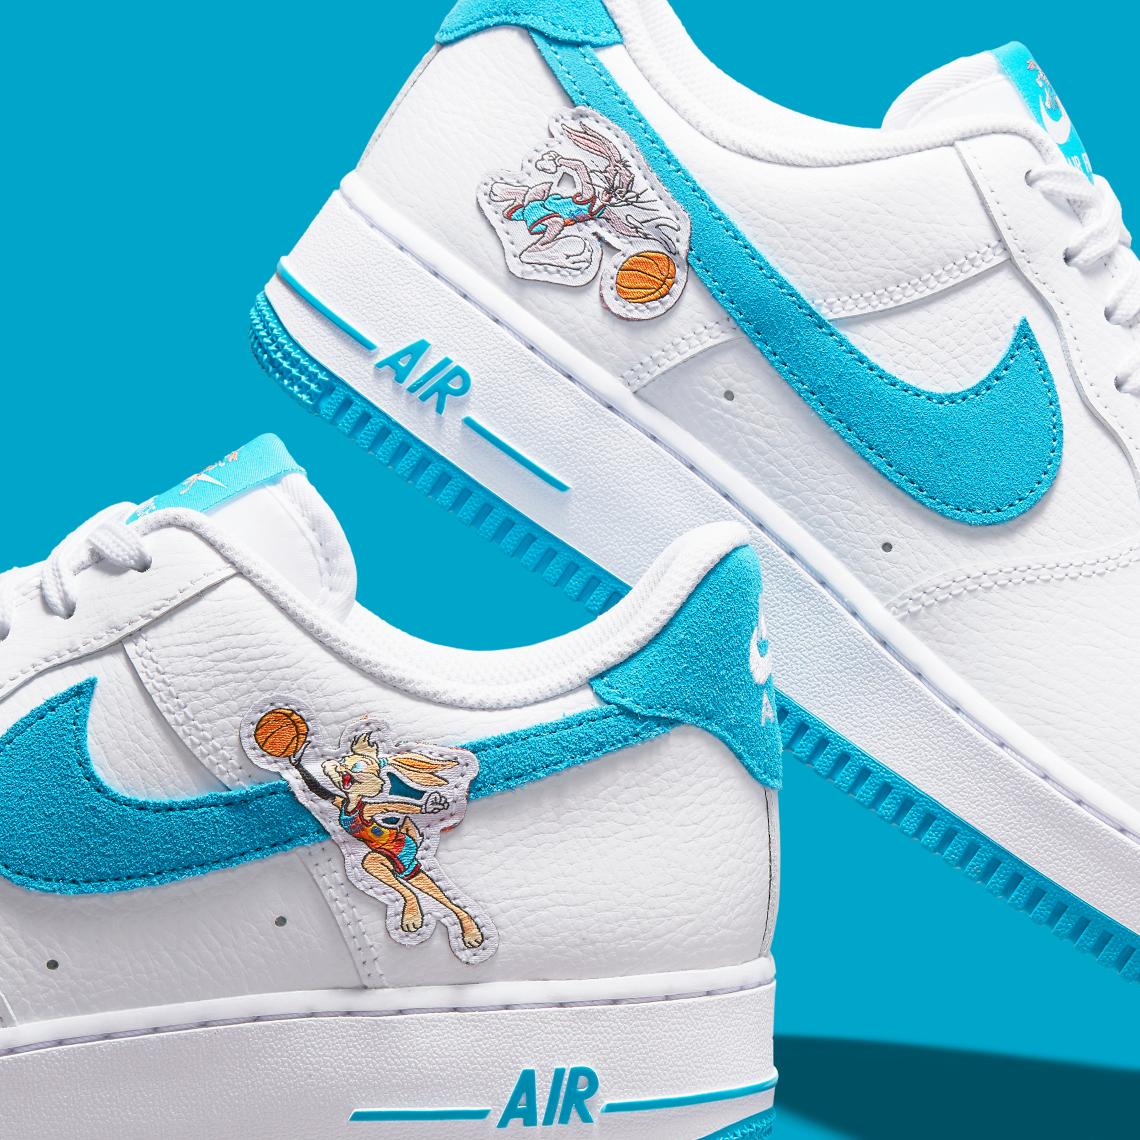 Space Jam x Nike Air Force 1 '07 ''Toon Squad'' - DJ7998-100